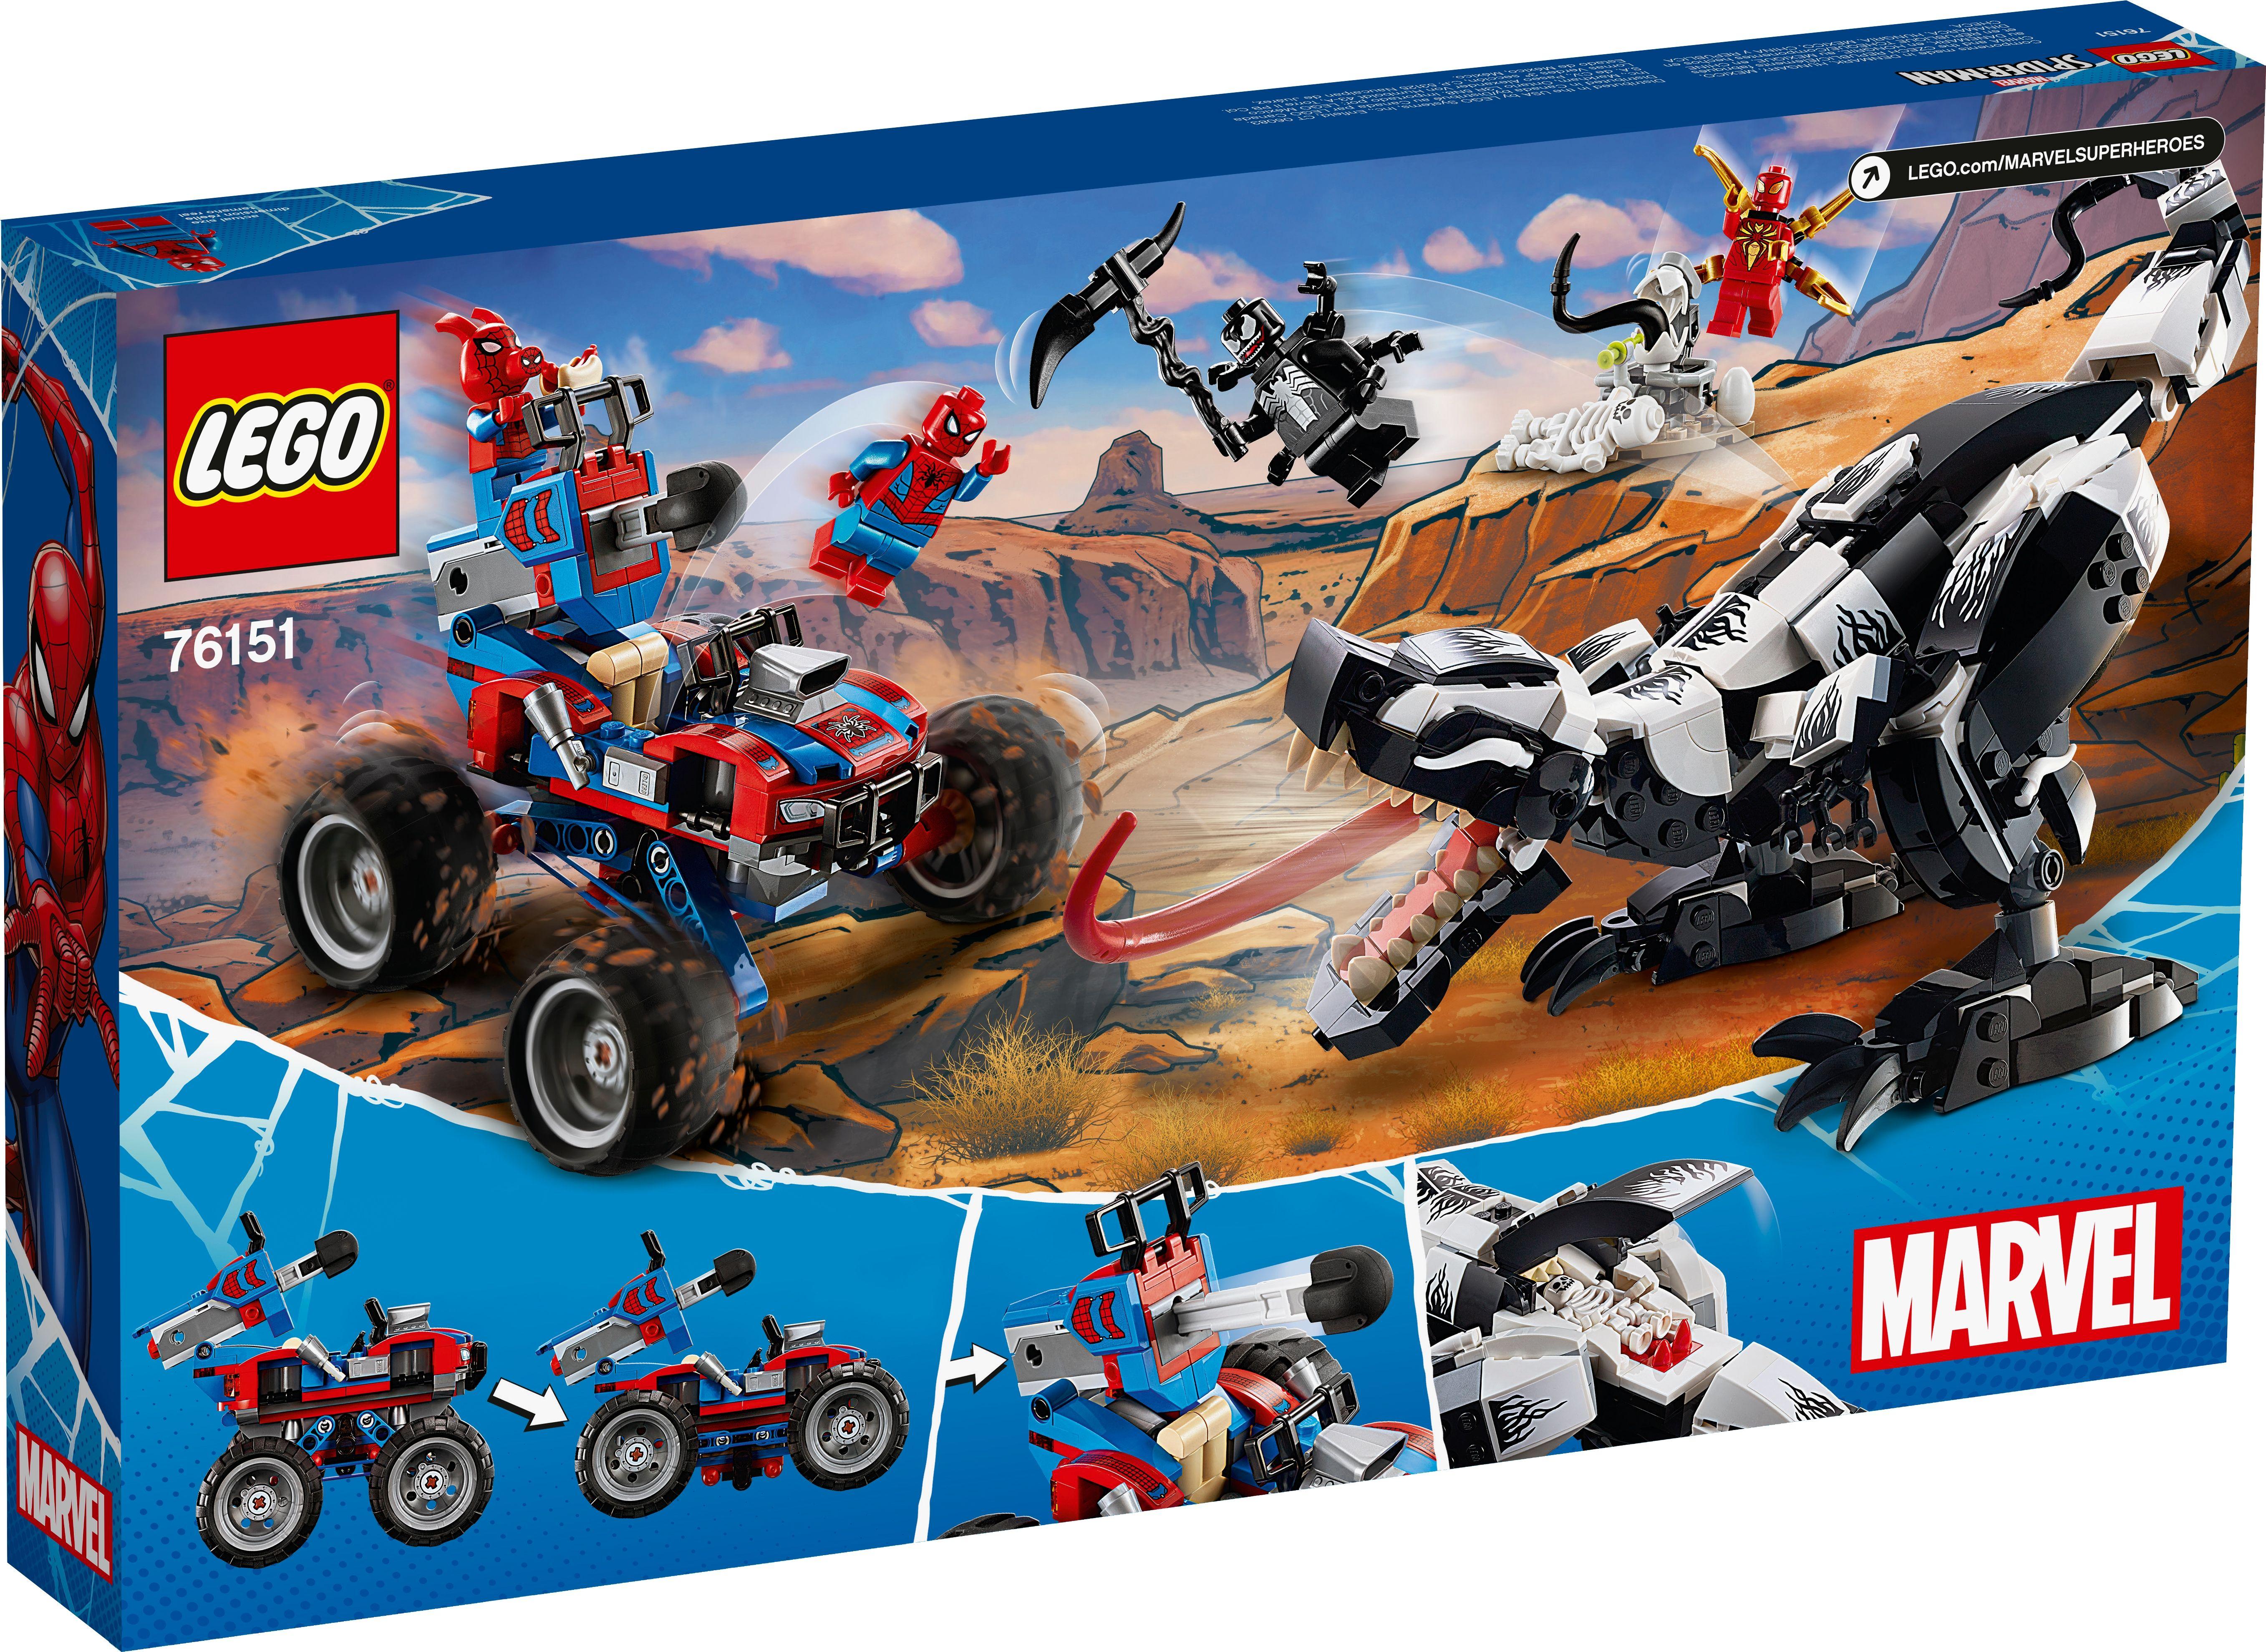 Venomosaurus Ambush 76151 Marvel Buy Online At The Official Lego Shop Us Lego Marvel Lego Marvel Super Heroes Lego Marvel S Avengers